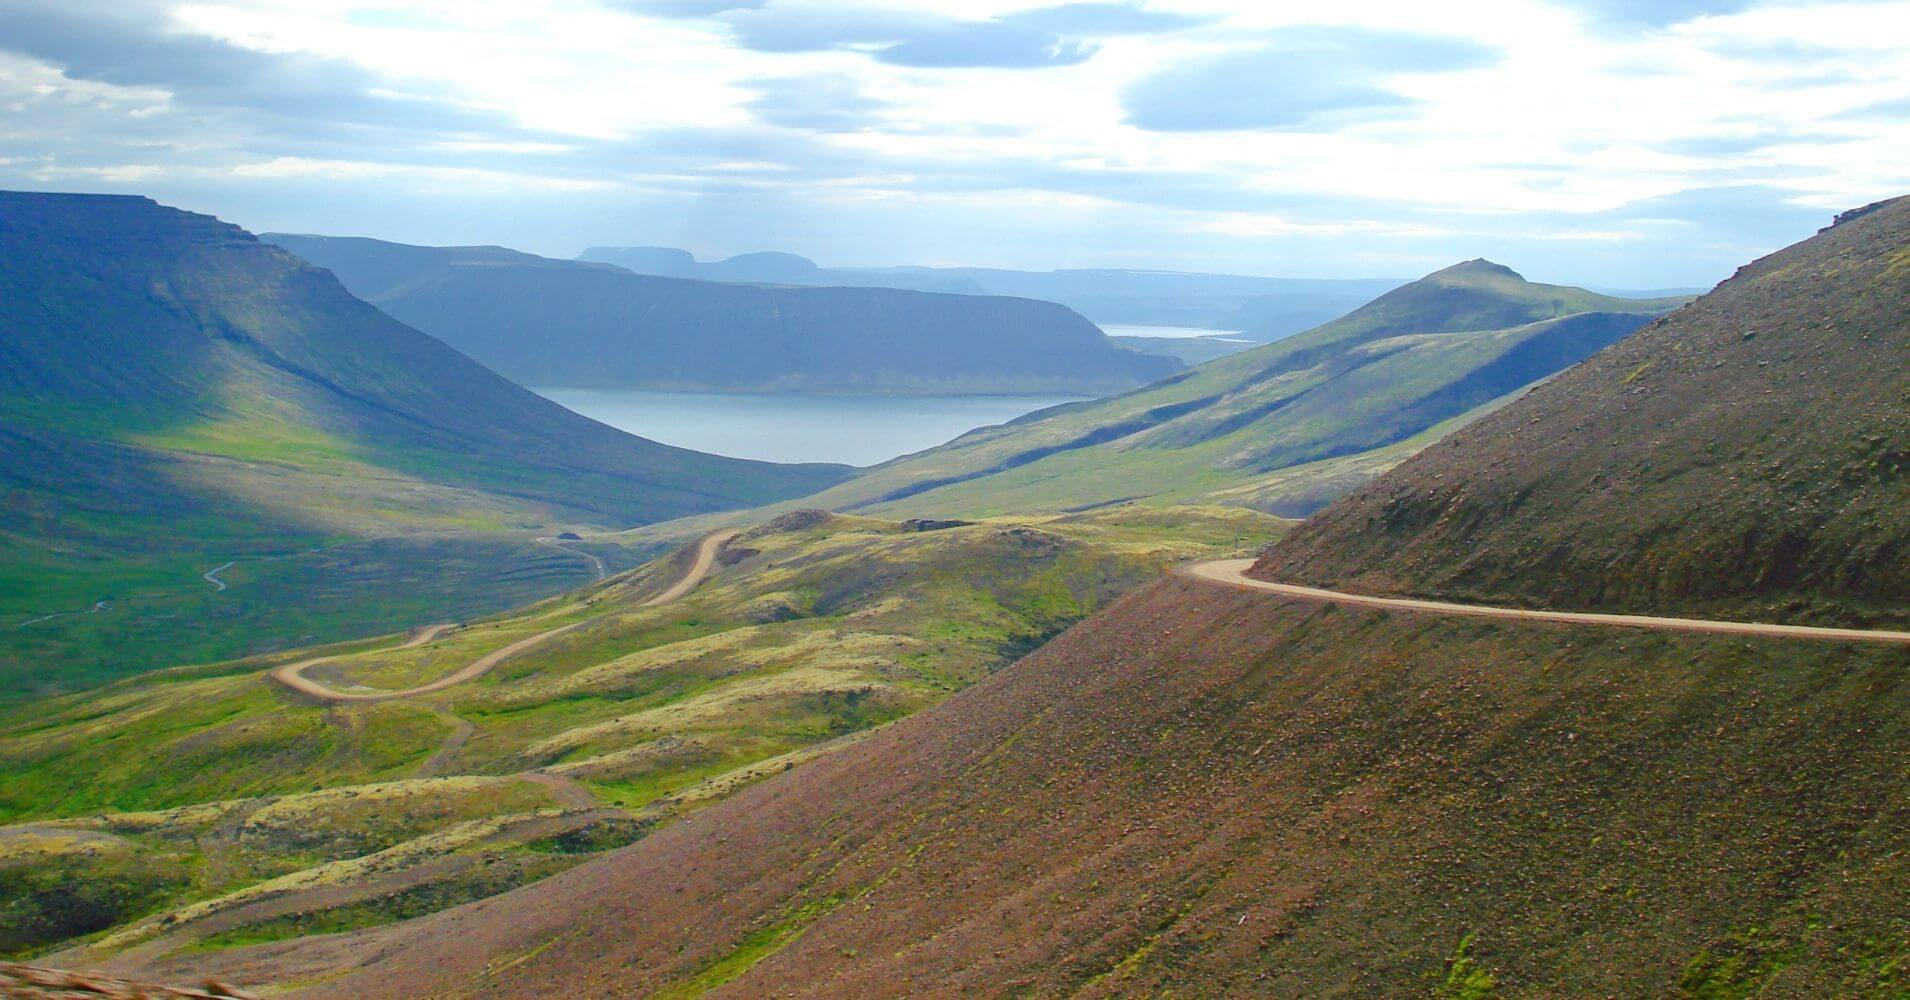 Carretera Vestfirðir. Fiordos del Oeste. Ísafjörður. Islandia.